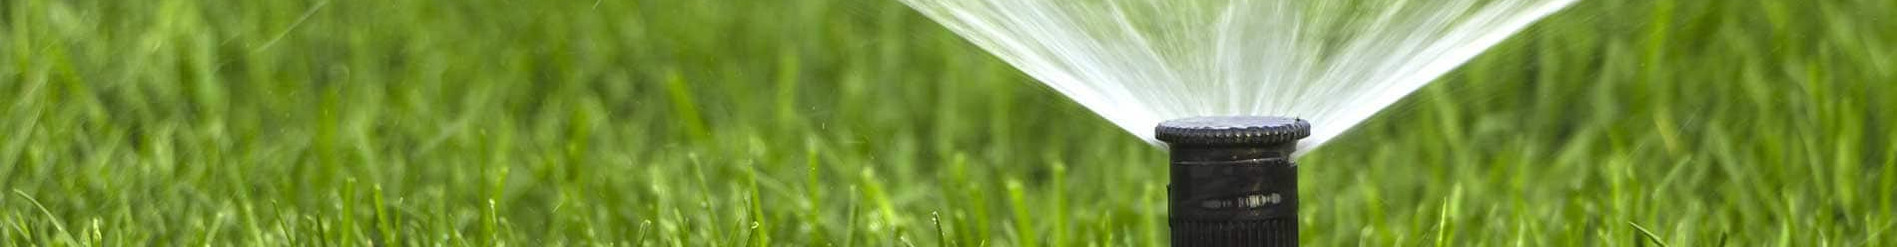 Irrigation Page 2.jpg